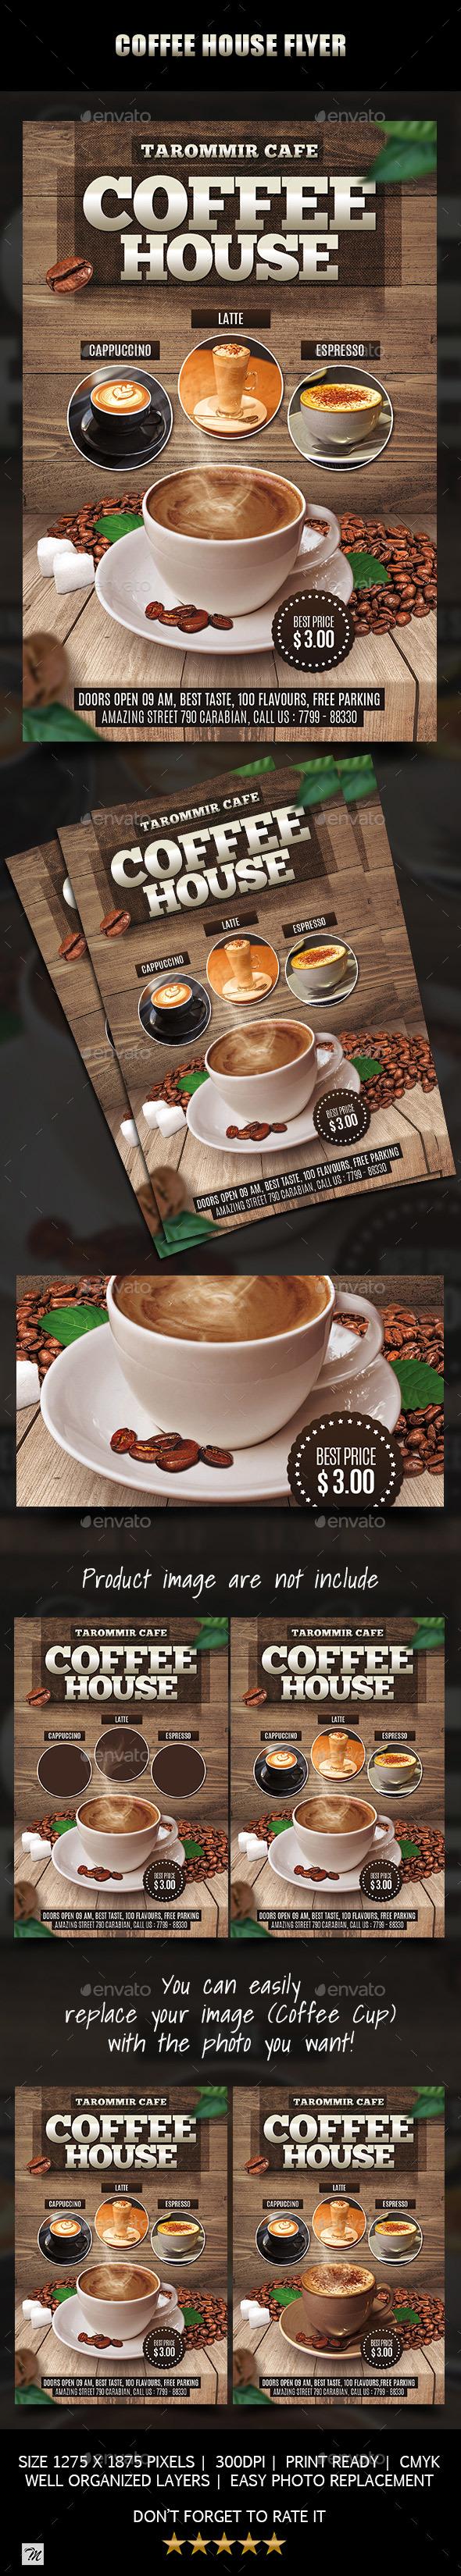 Coffee House Flyer - Restaurant Flyers